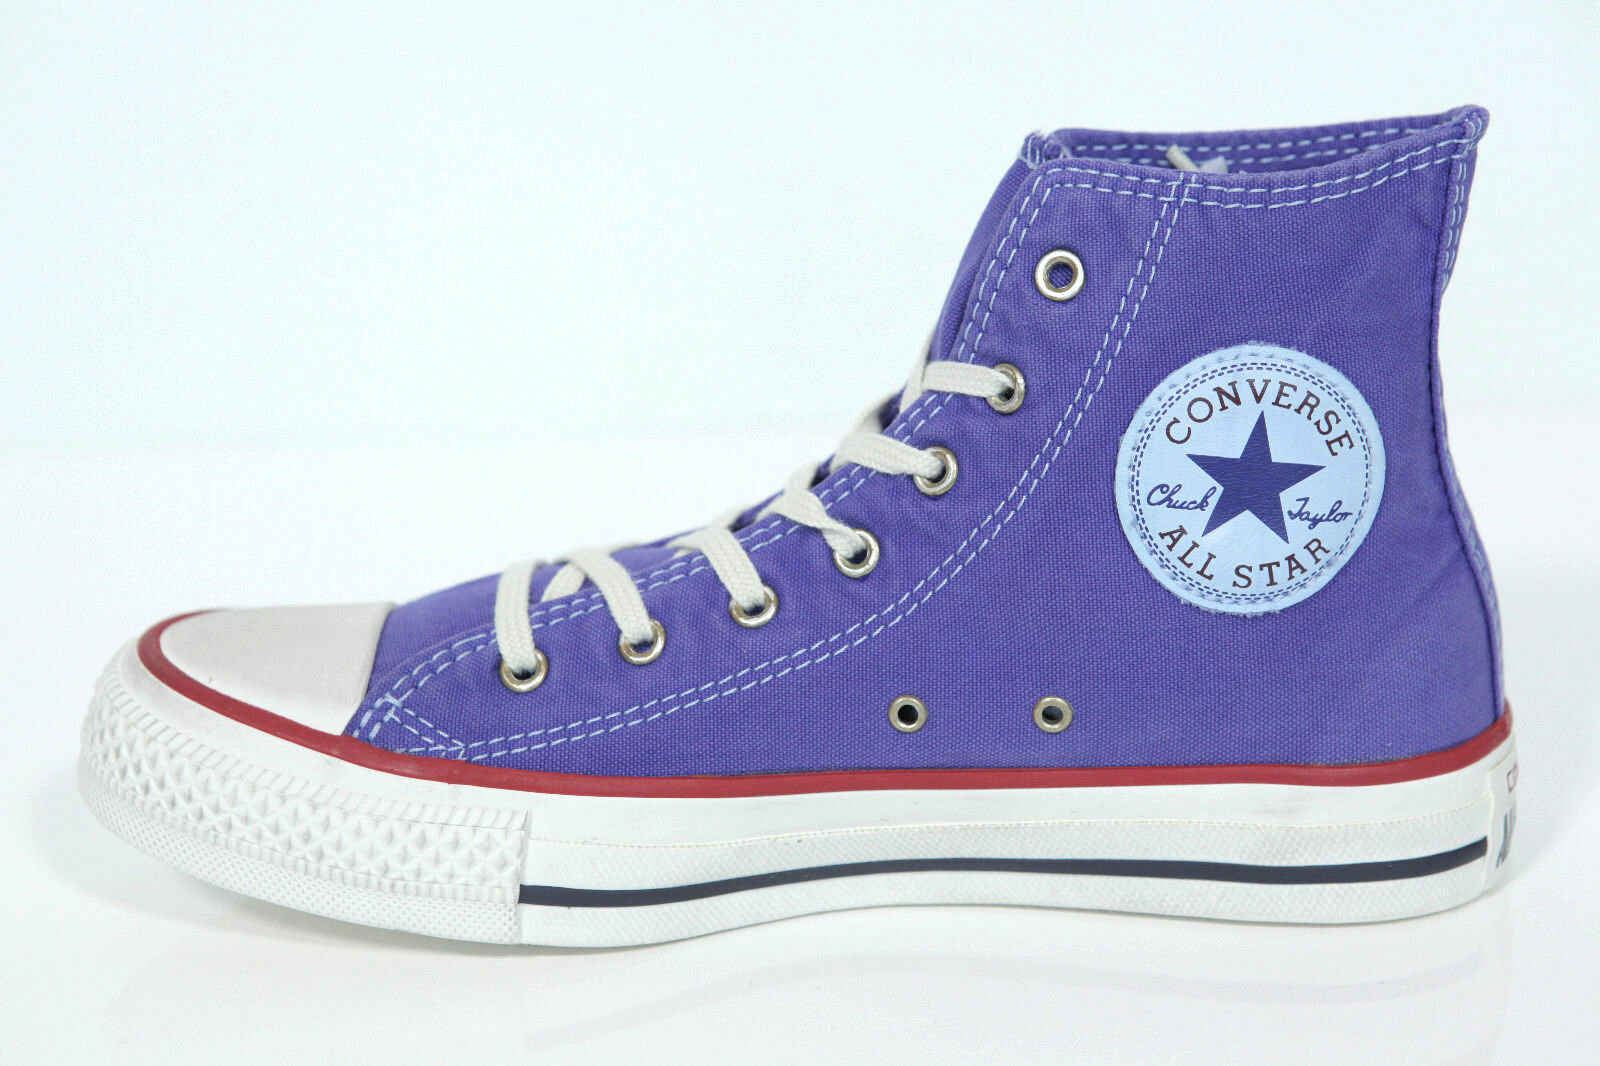 Neu All Star Converse Chucks Hi Washed Nightshade 142629c Sneaker Retro